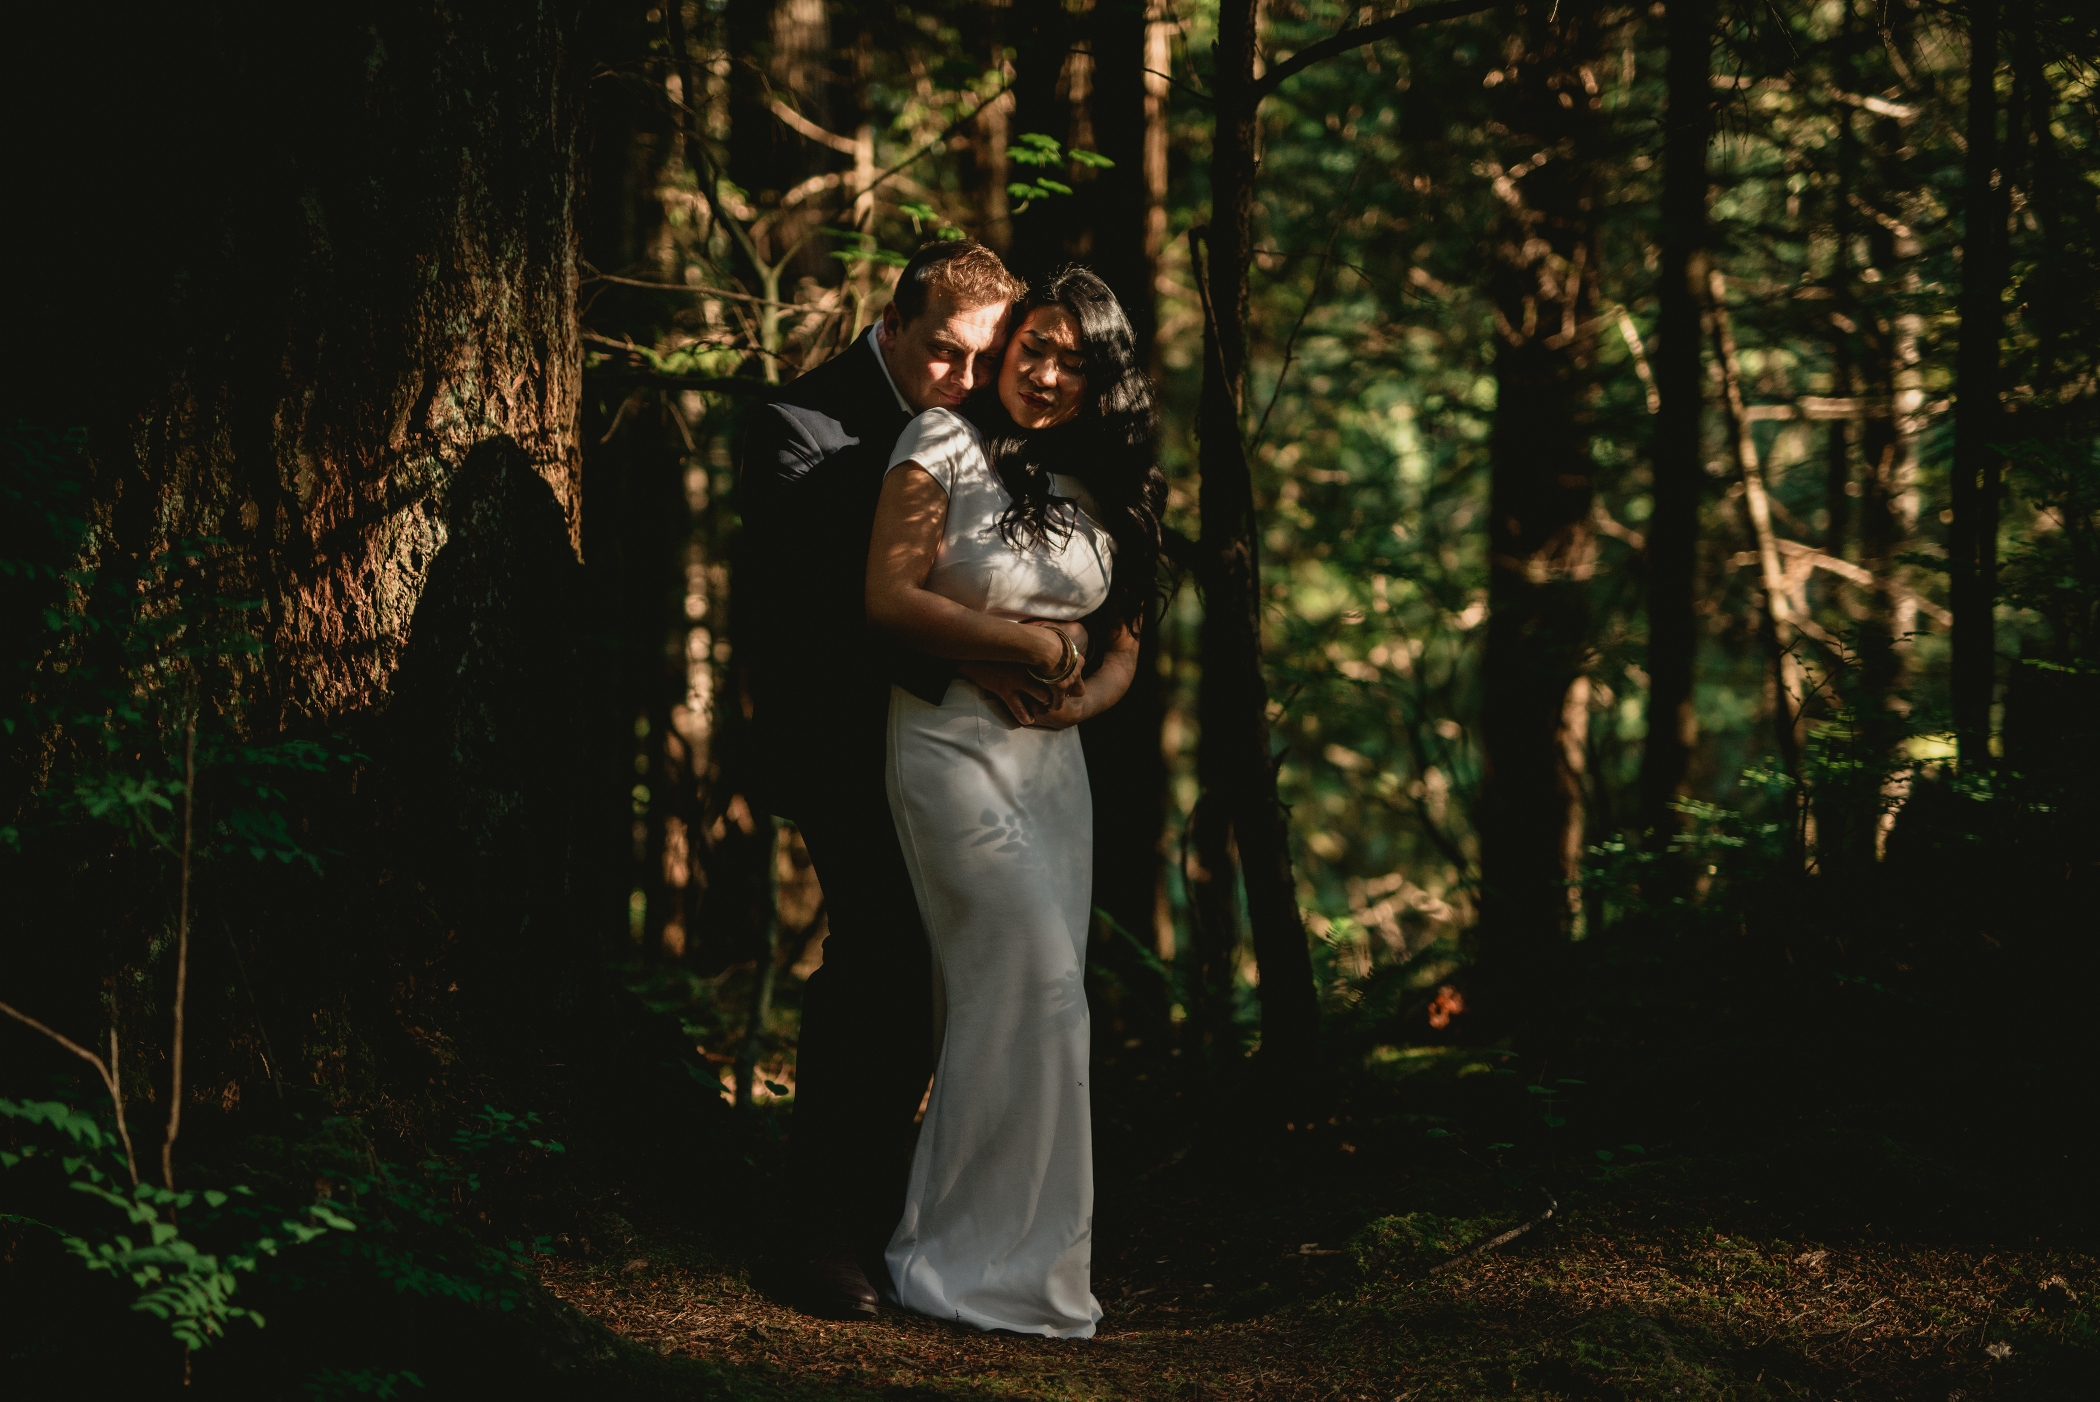 Dark and Moody Wedding photographer Vancouver BC047.jpg